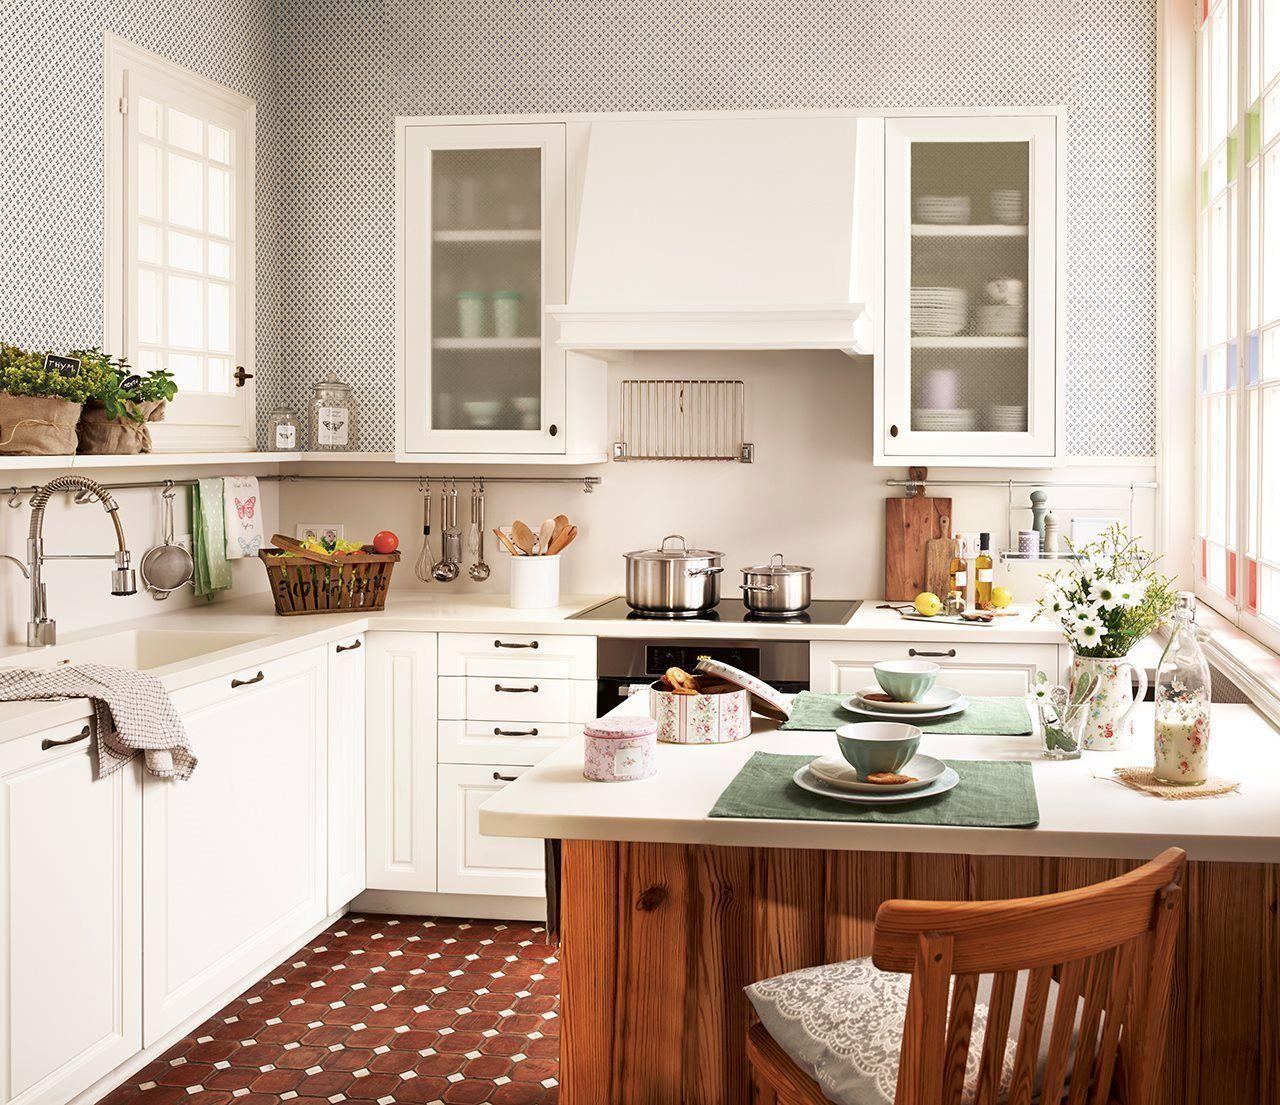 малка но перфектна кухня artcafe kitchen design small kitchen perfect design interior sol on l kitchen remodel id=87797